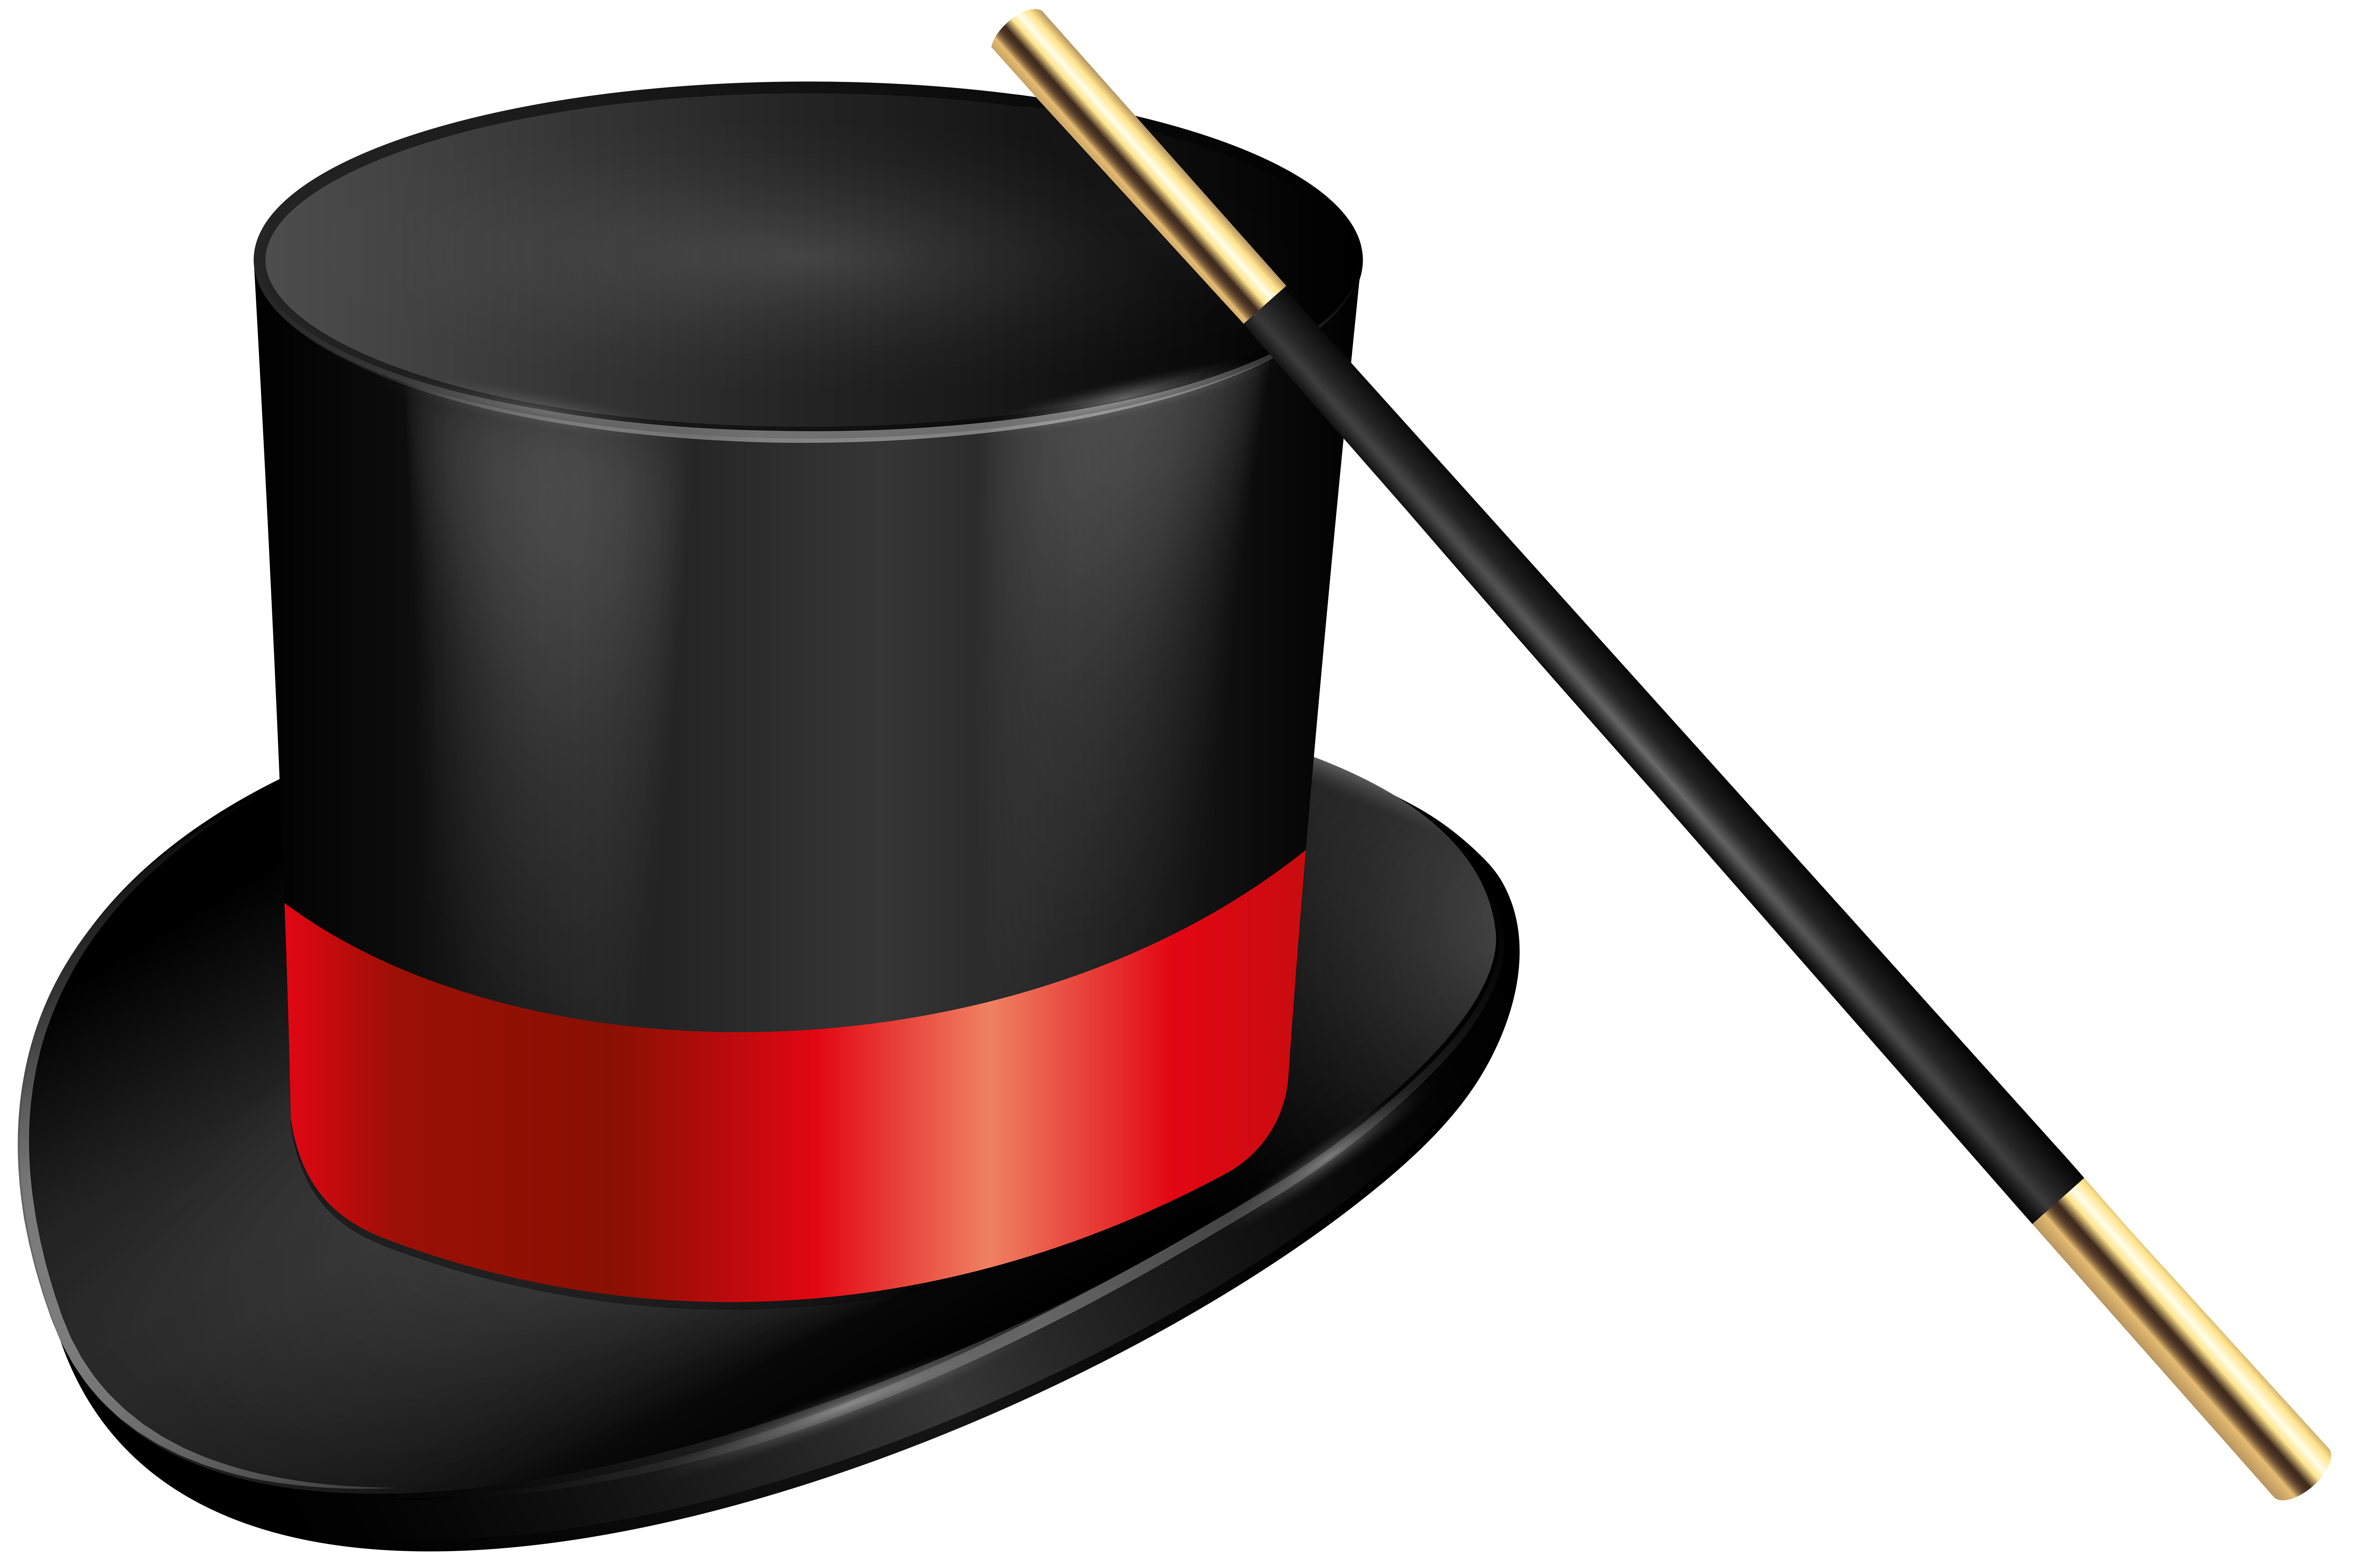 Magic Hat and Magic Wand PNG Clip Art Image.